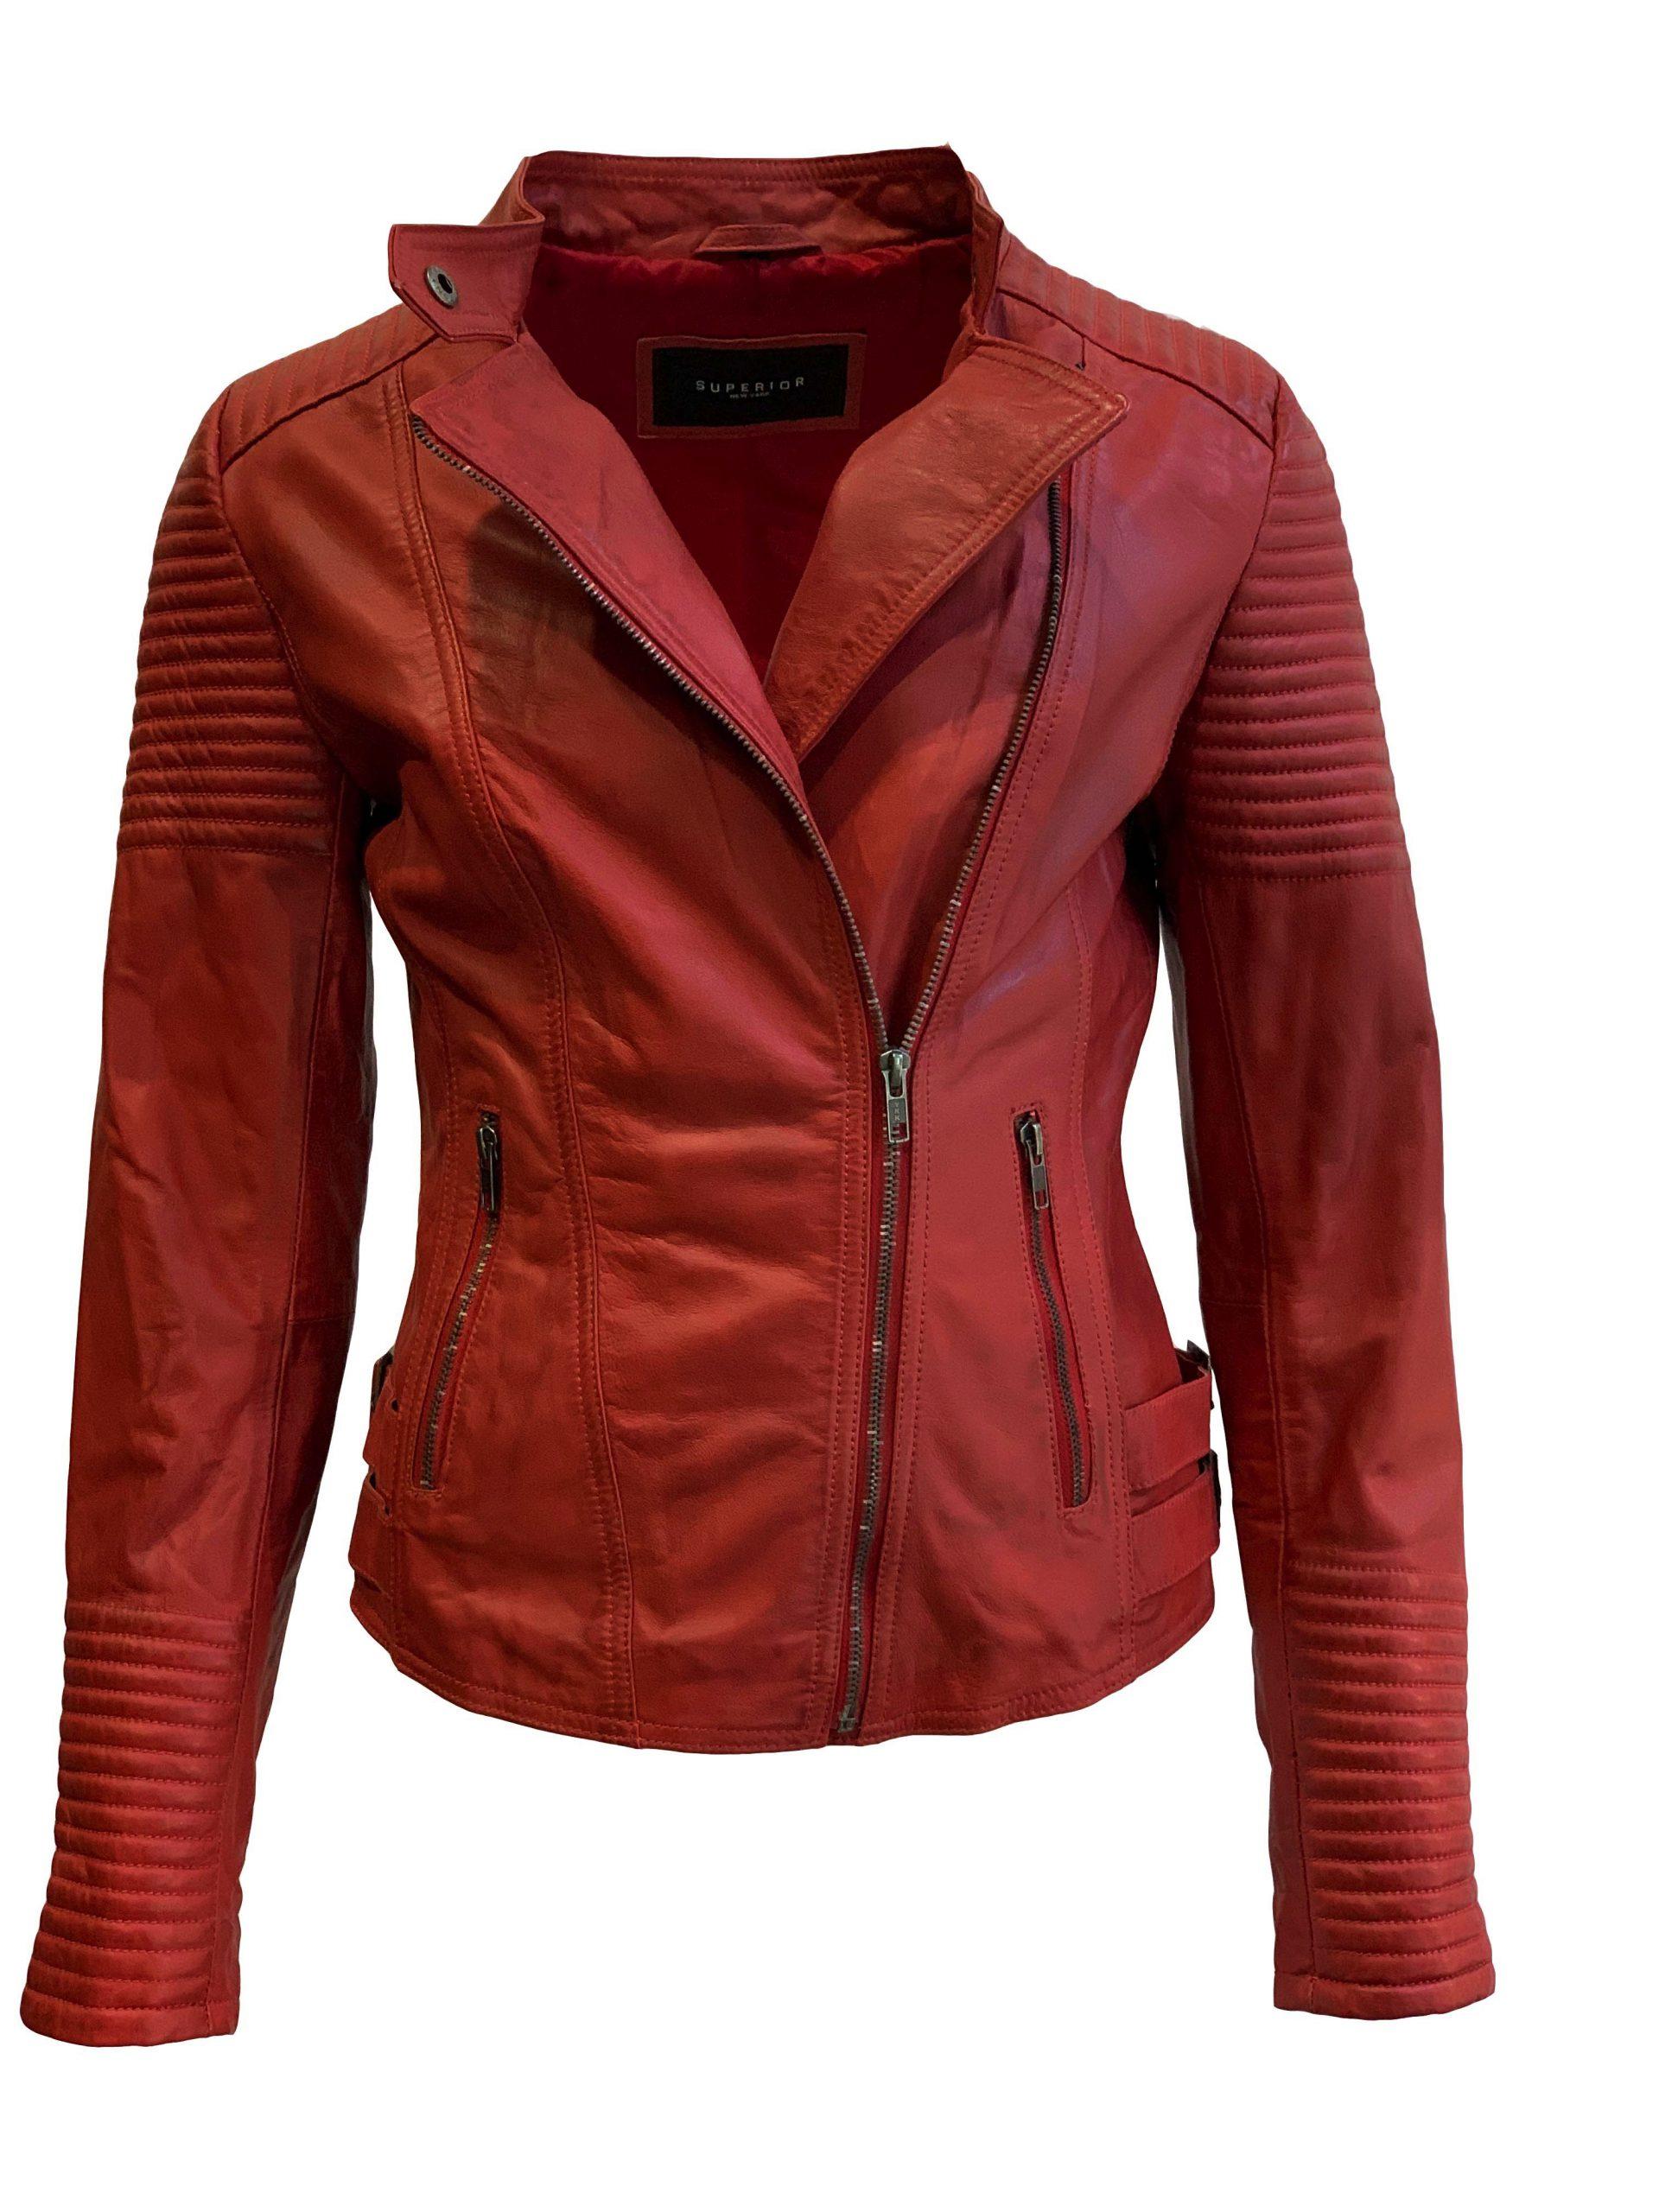 Leren jas dames biker rood 100% echt leder-barcelona